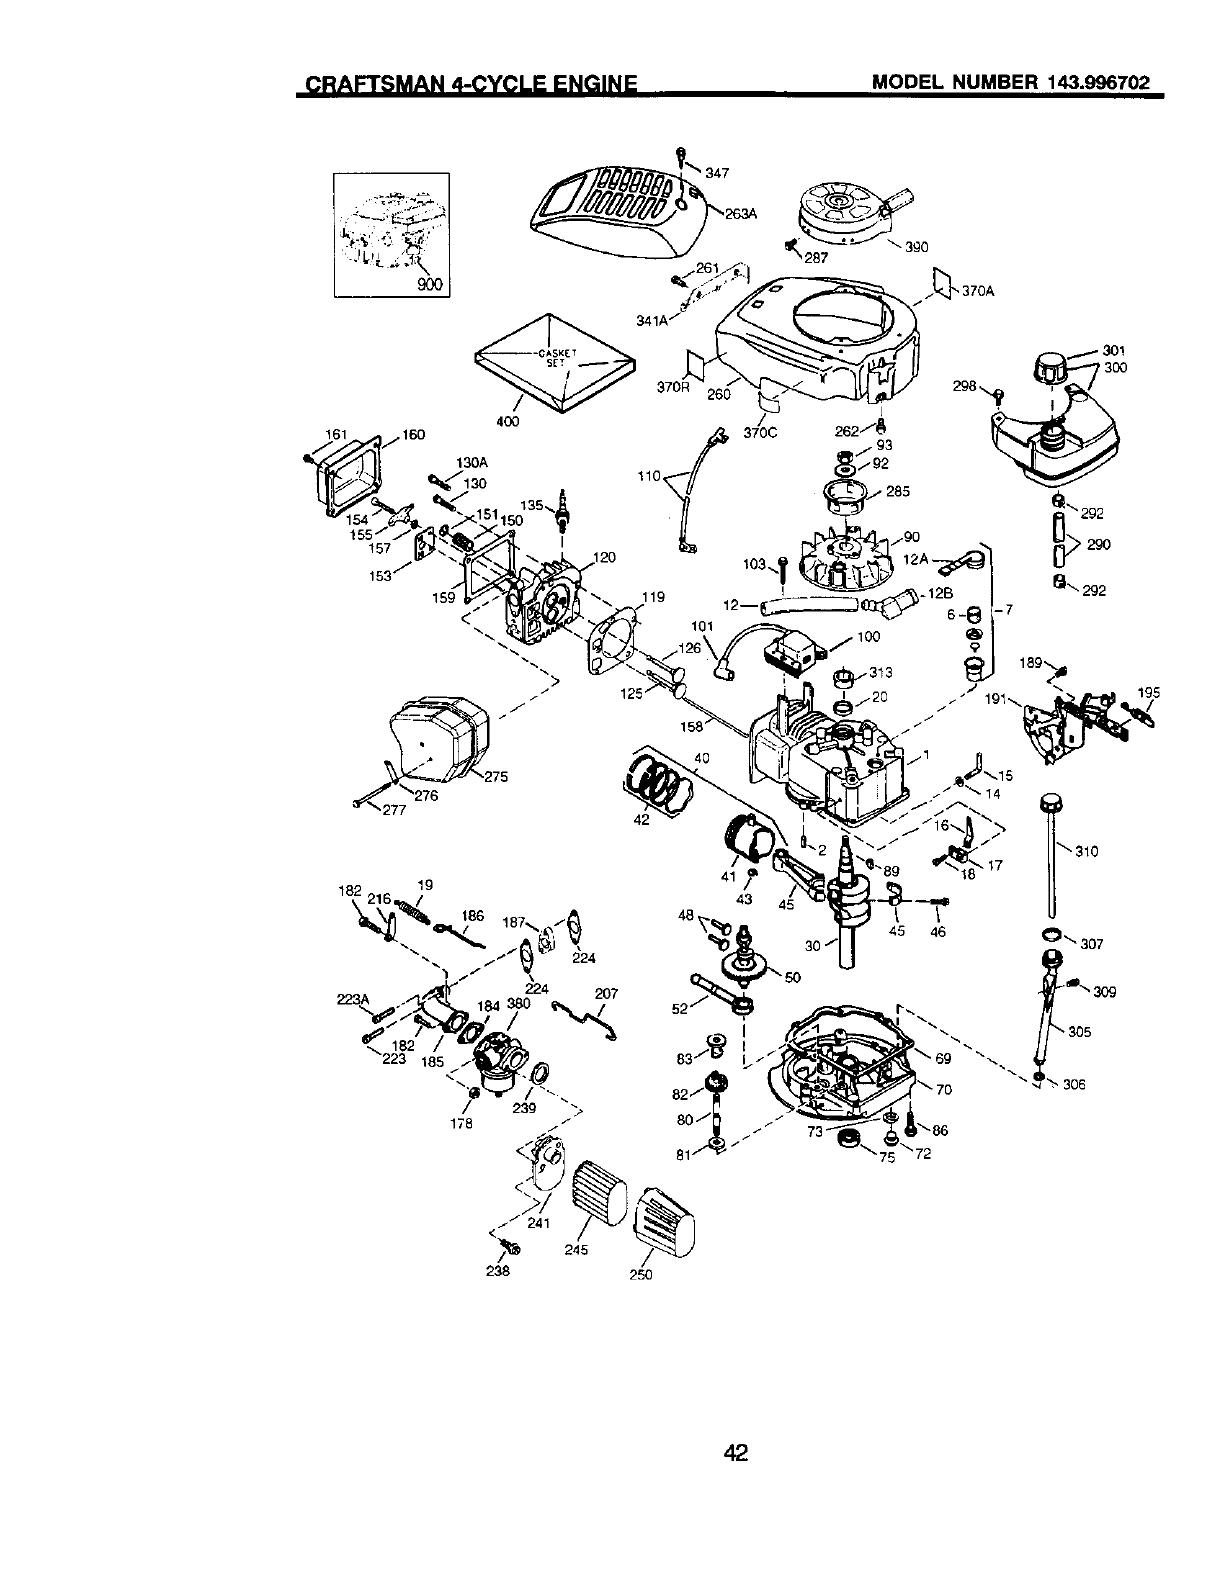 Craftsman 917377911 User Manual 6.75HP 21 ROTARY LAWN